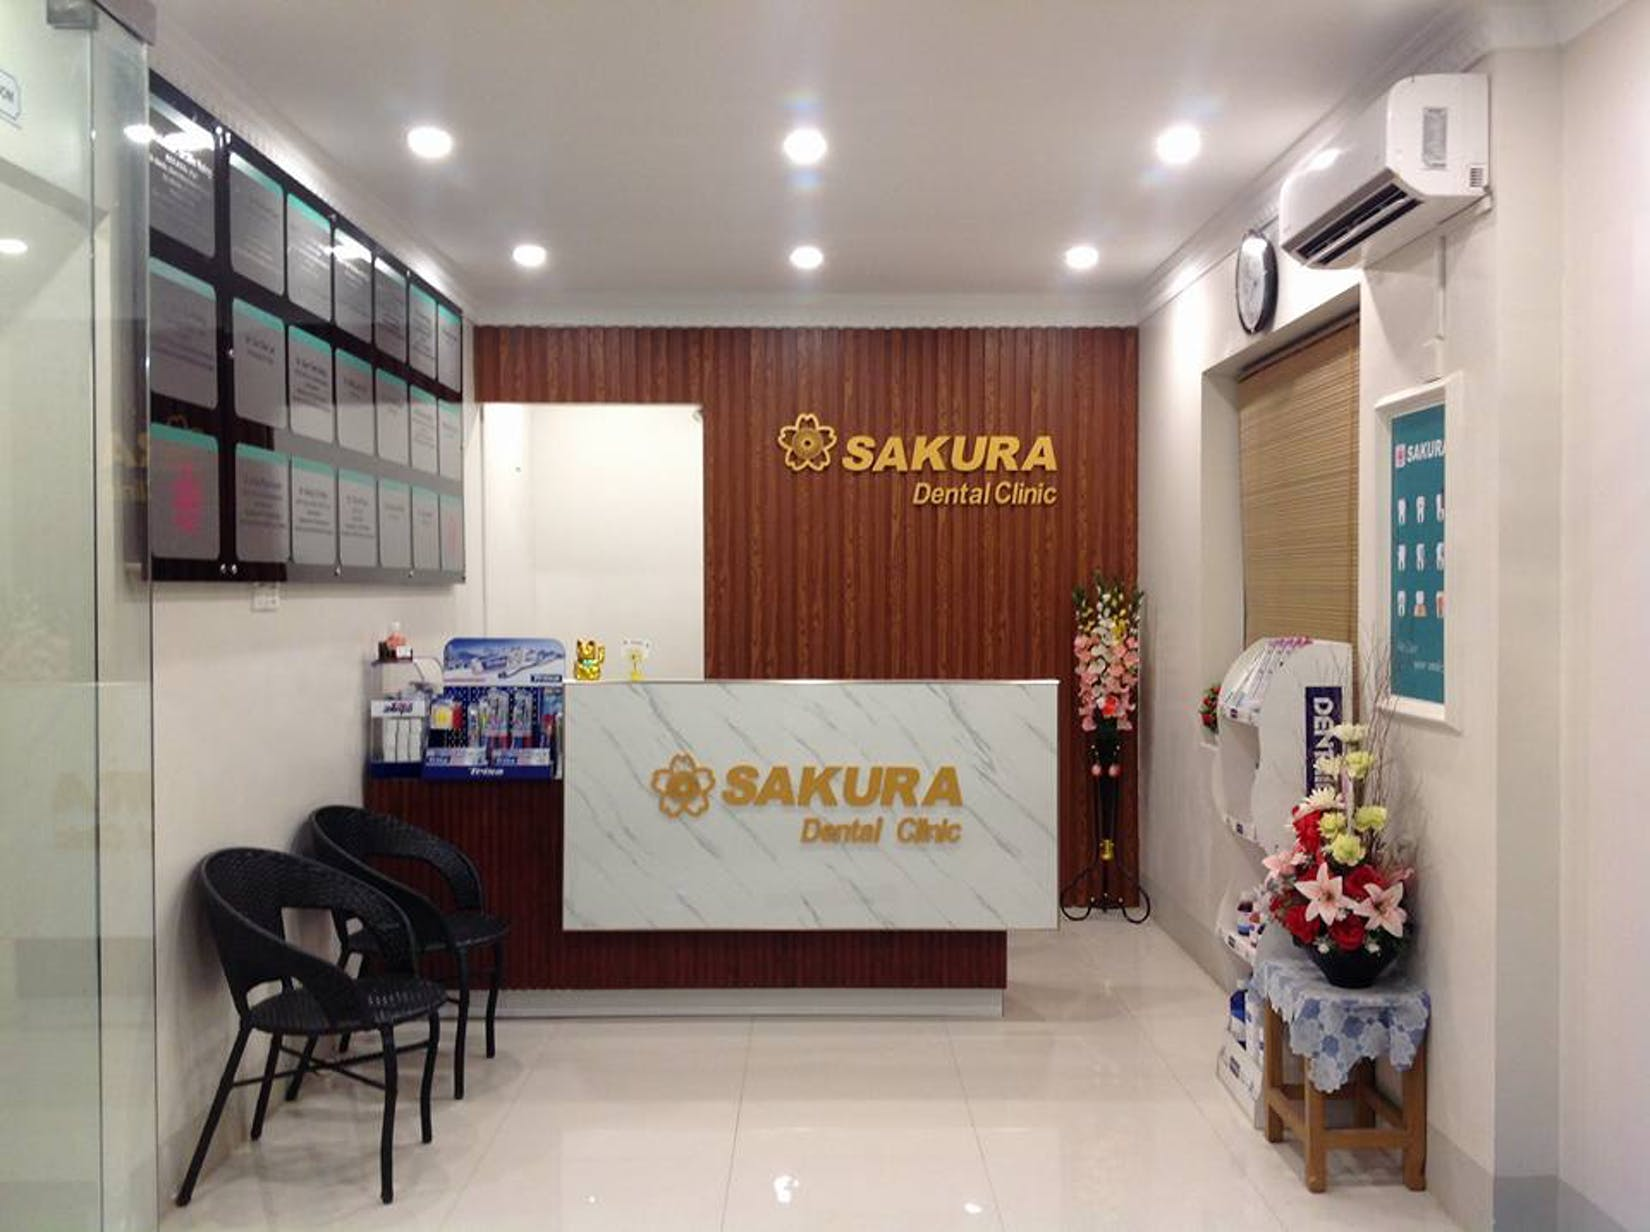 Sakura Dental Clinic - North Dagon | Medical